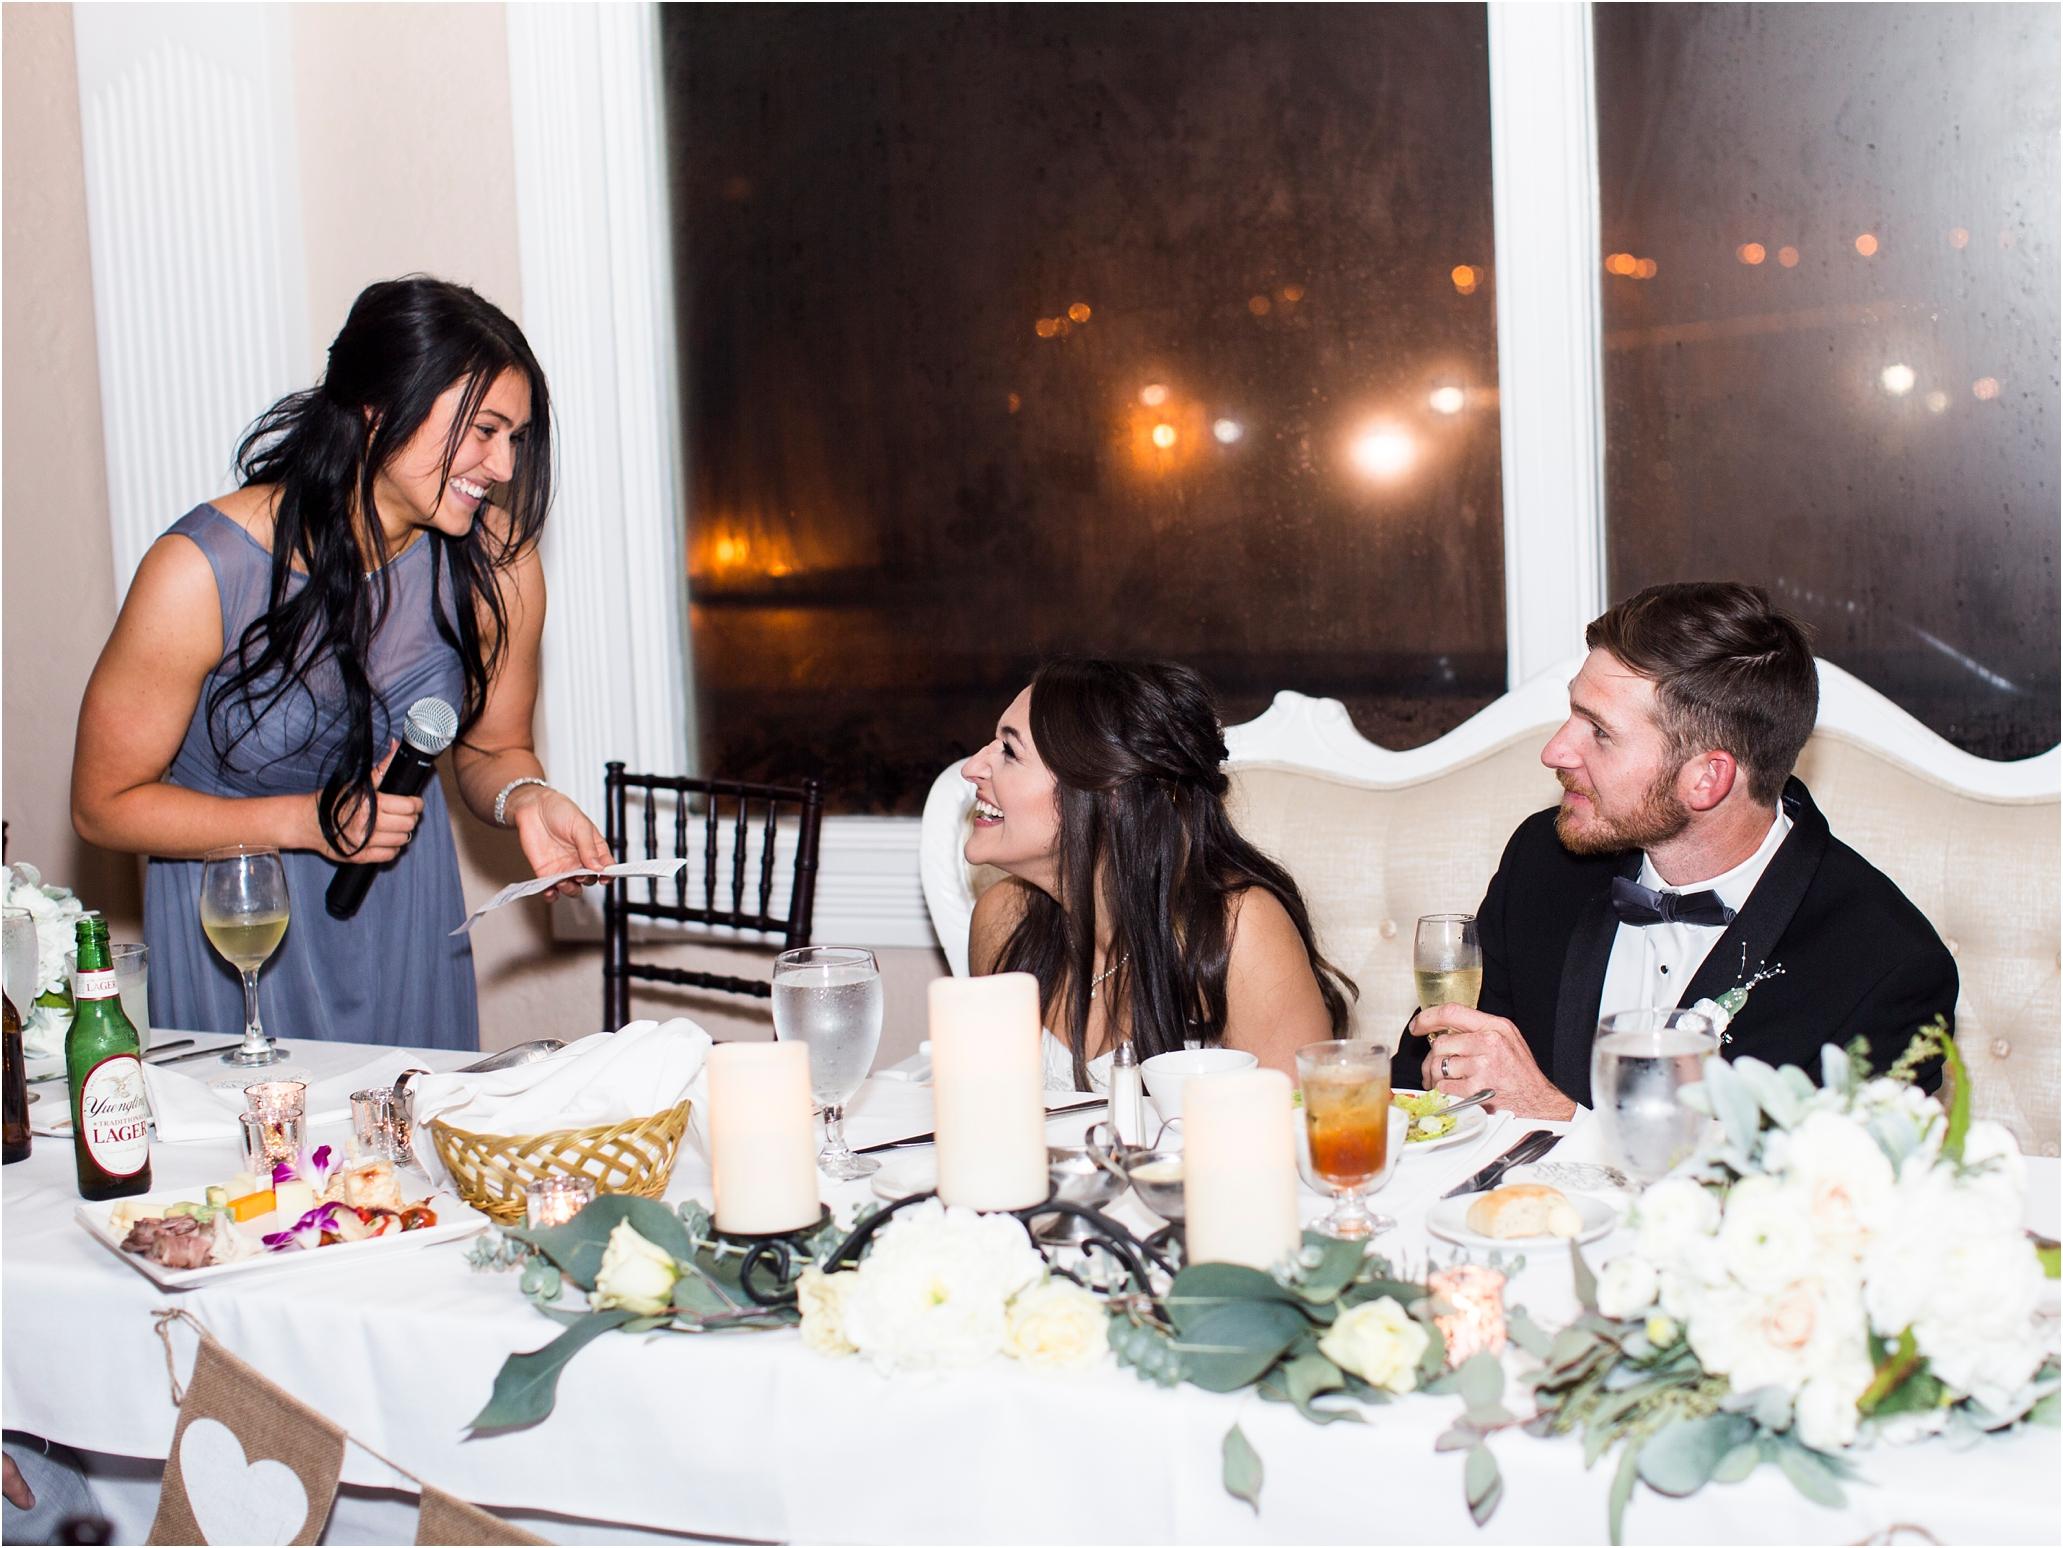 Lisa Silva Photography- Ponte Vedra Beach and Jacksonville, Florida Fine Art Film Wedding Photography- Wedding at The White Room Villa Blanca in St. Augustine, Florida_0068.jpg